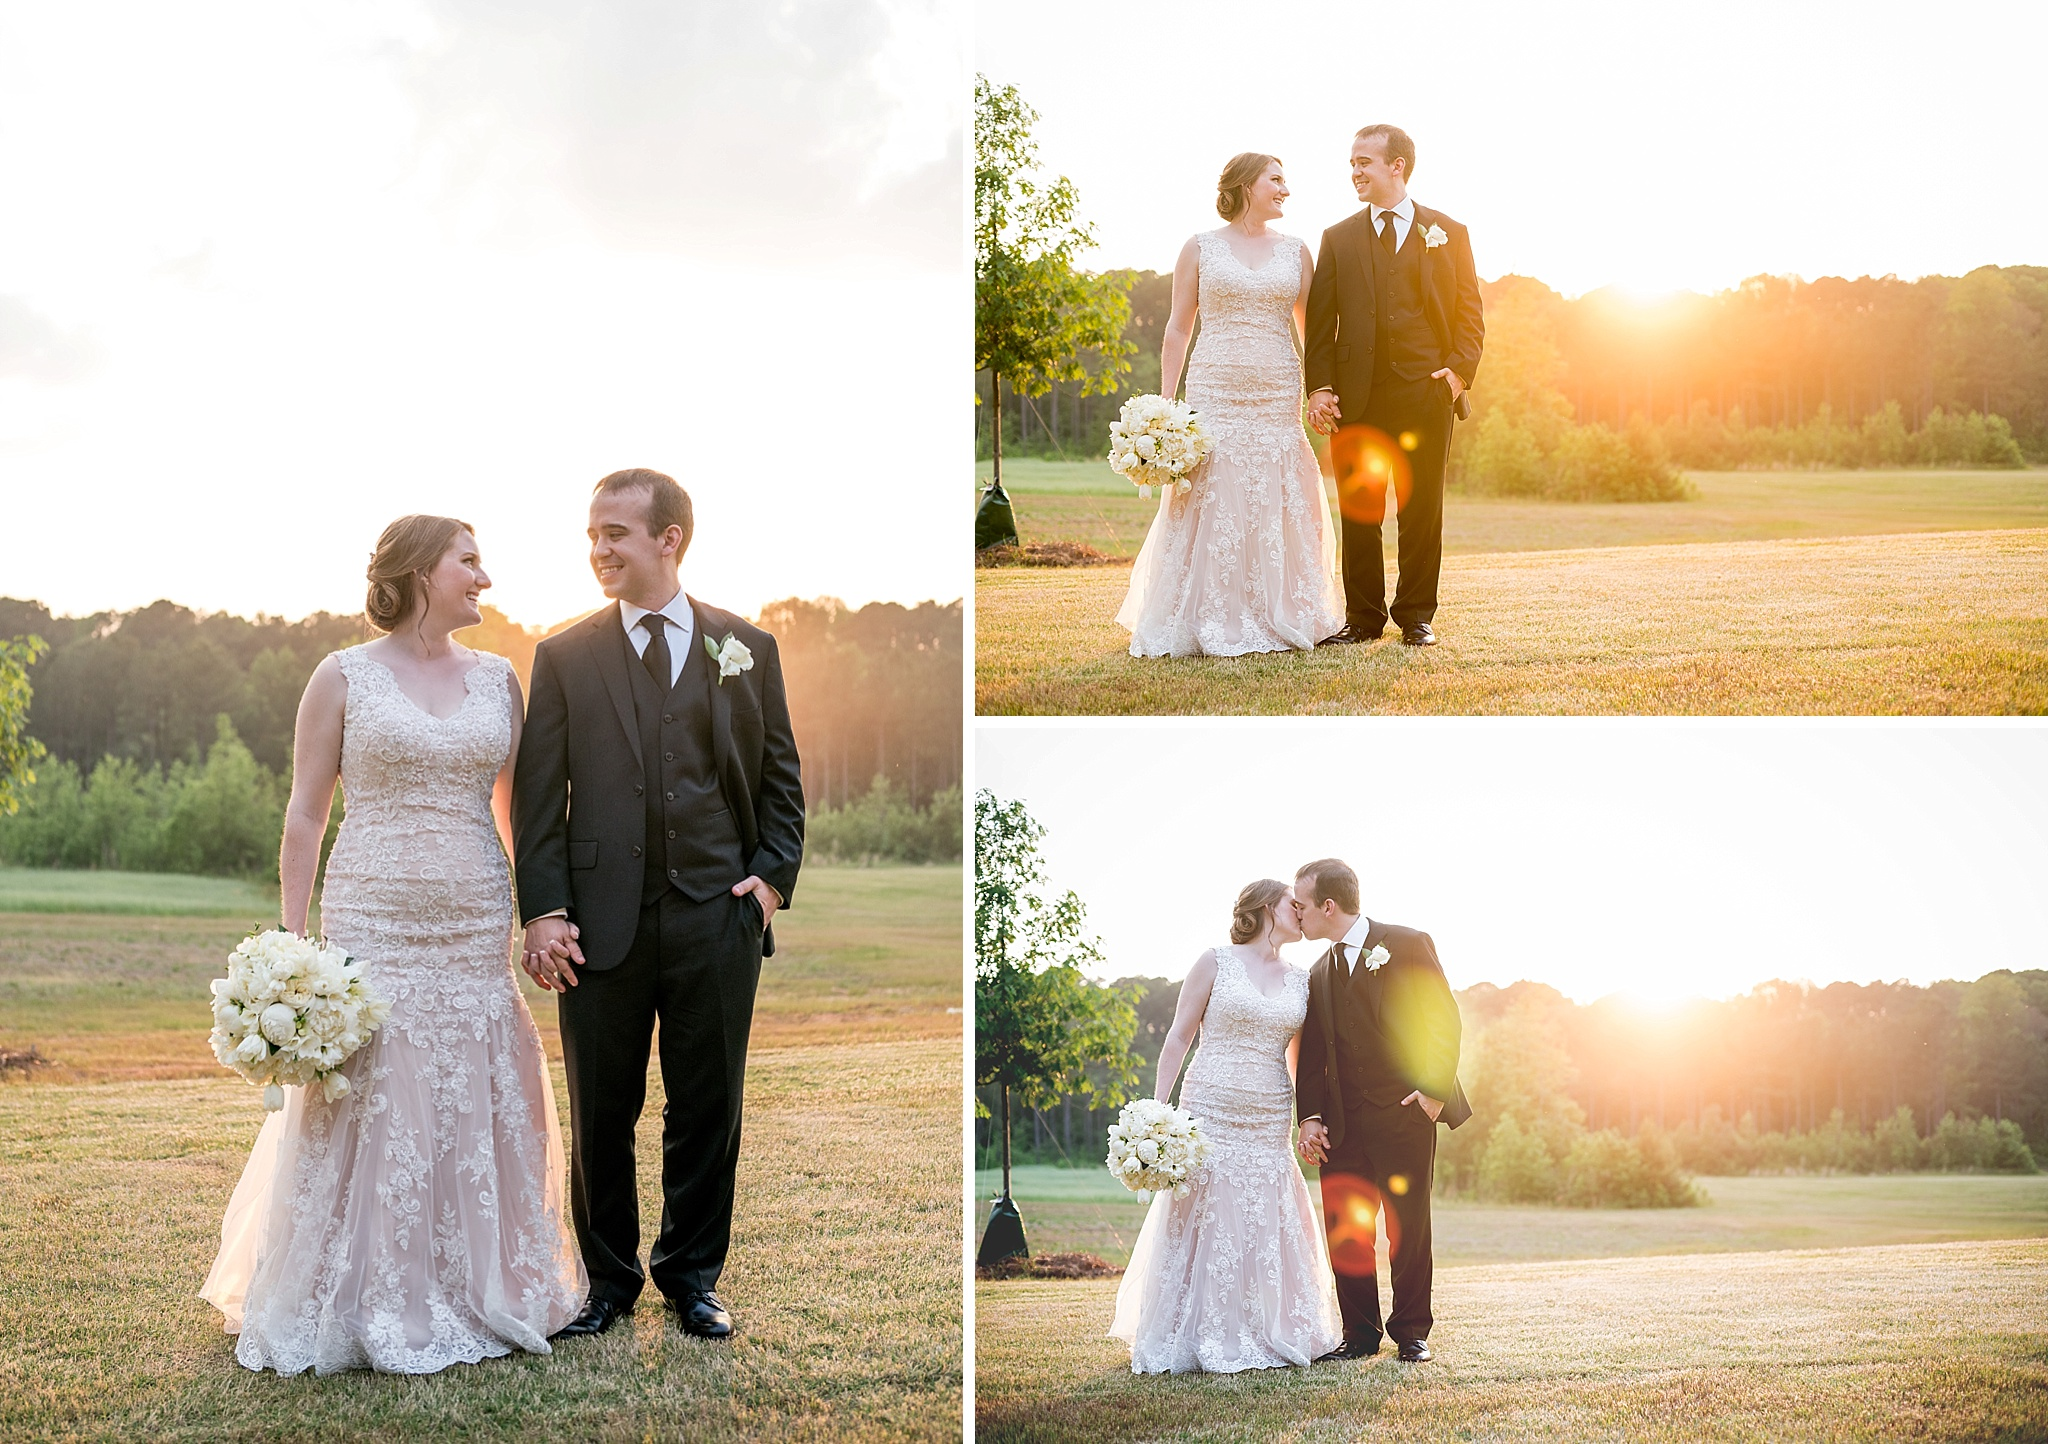 Pavilion-Carriage-Farms-Wedding-Photographer-225.jpg